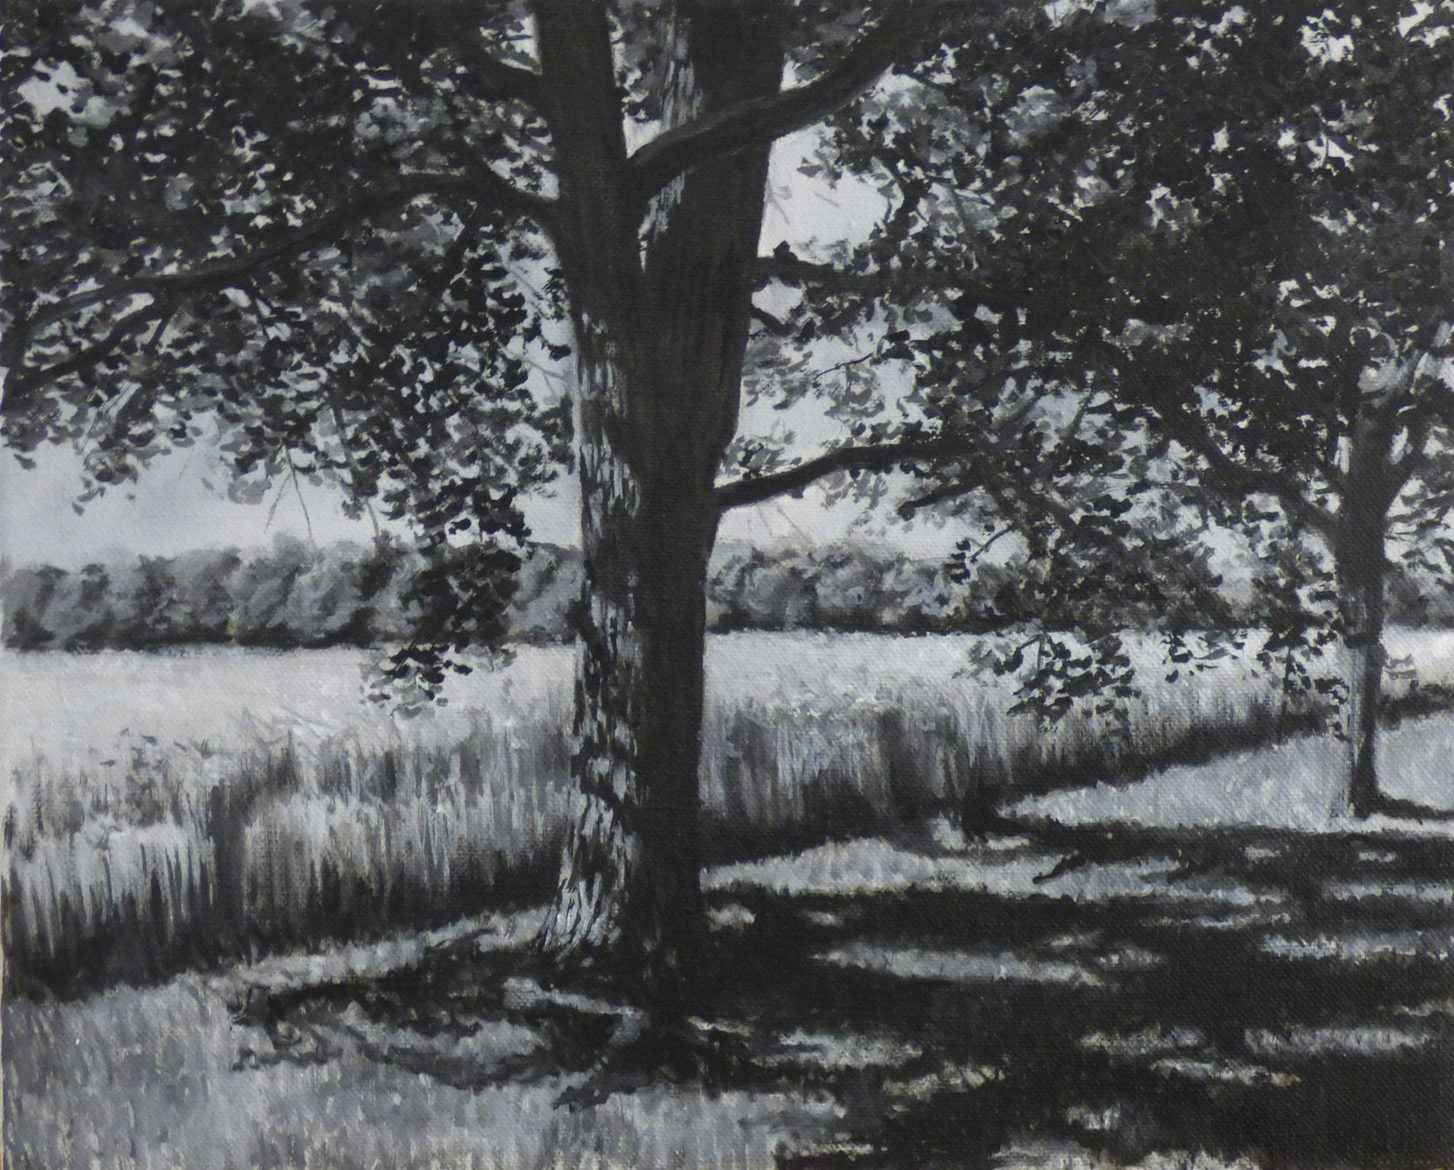 'Mönchshagen', 2018, 35 x 43 cm, oil on canvas